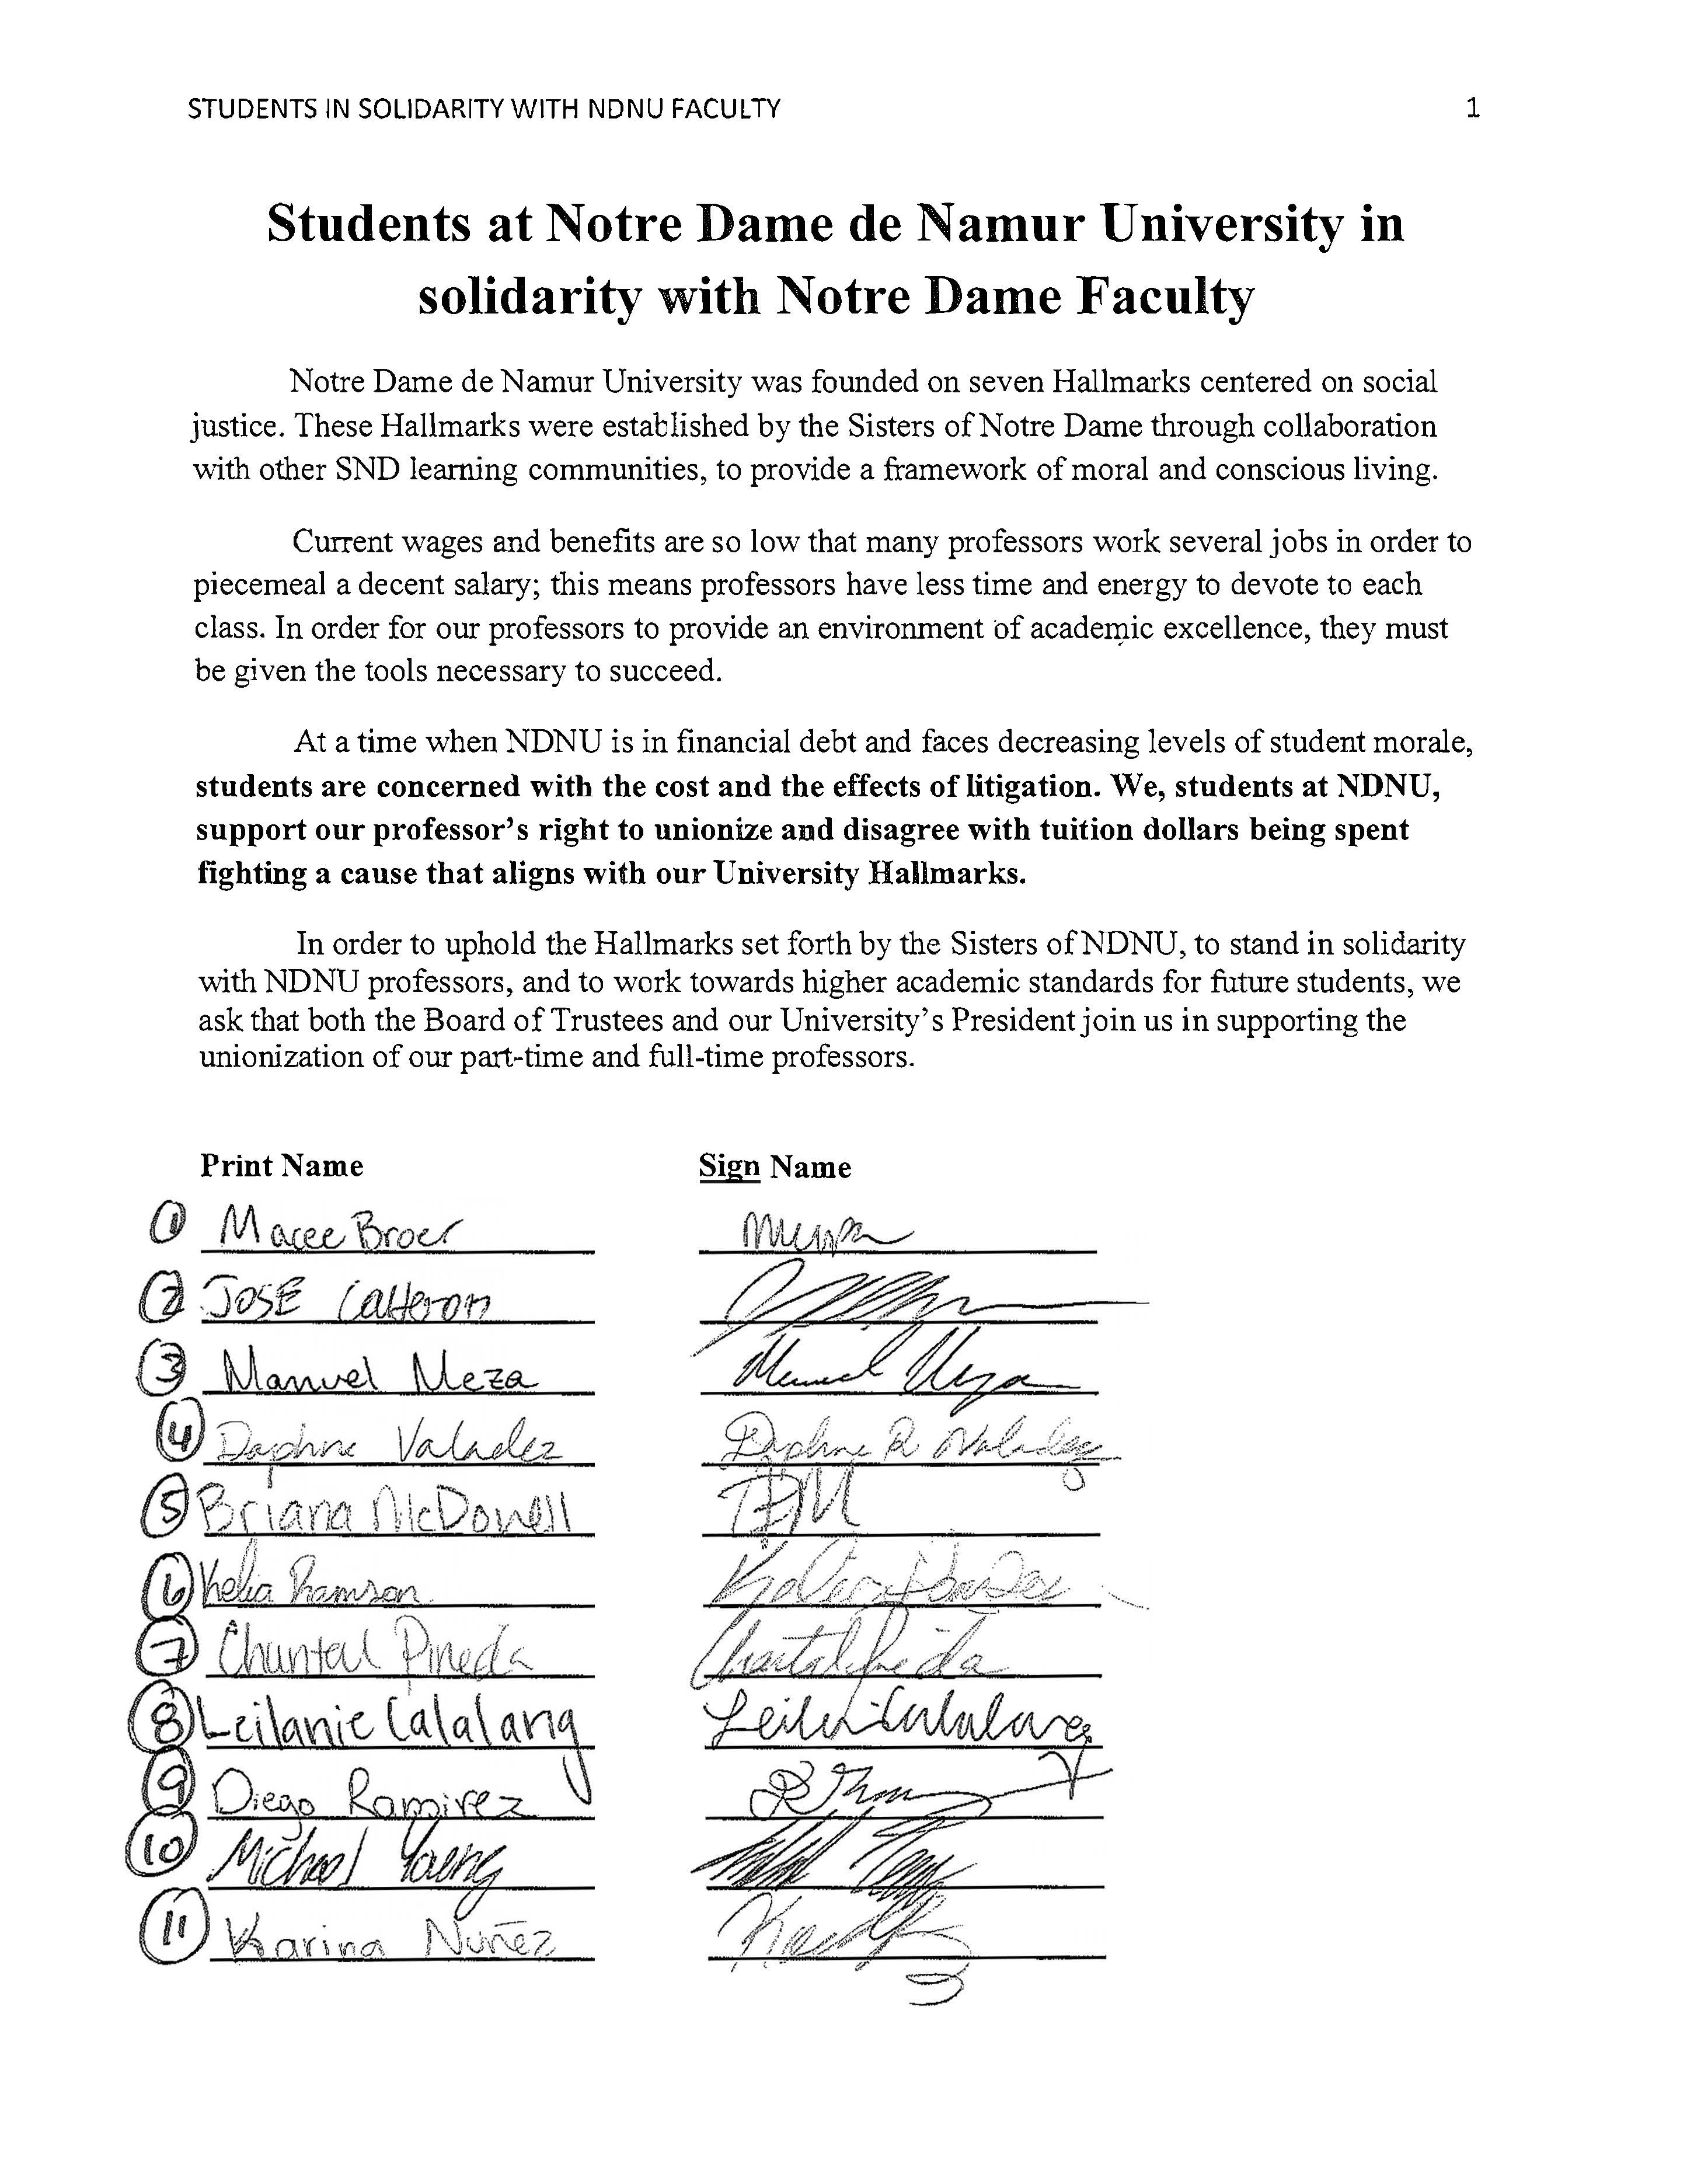 NDNU_signatures_Page_1.jpg